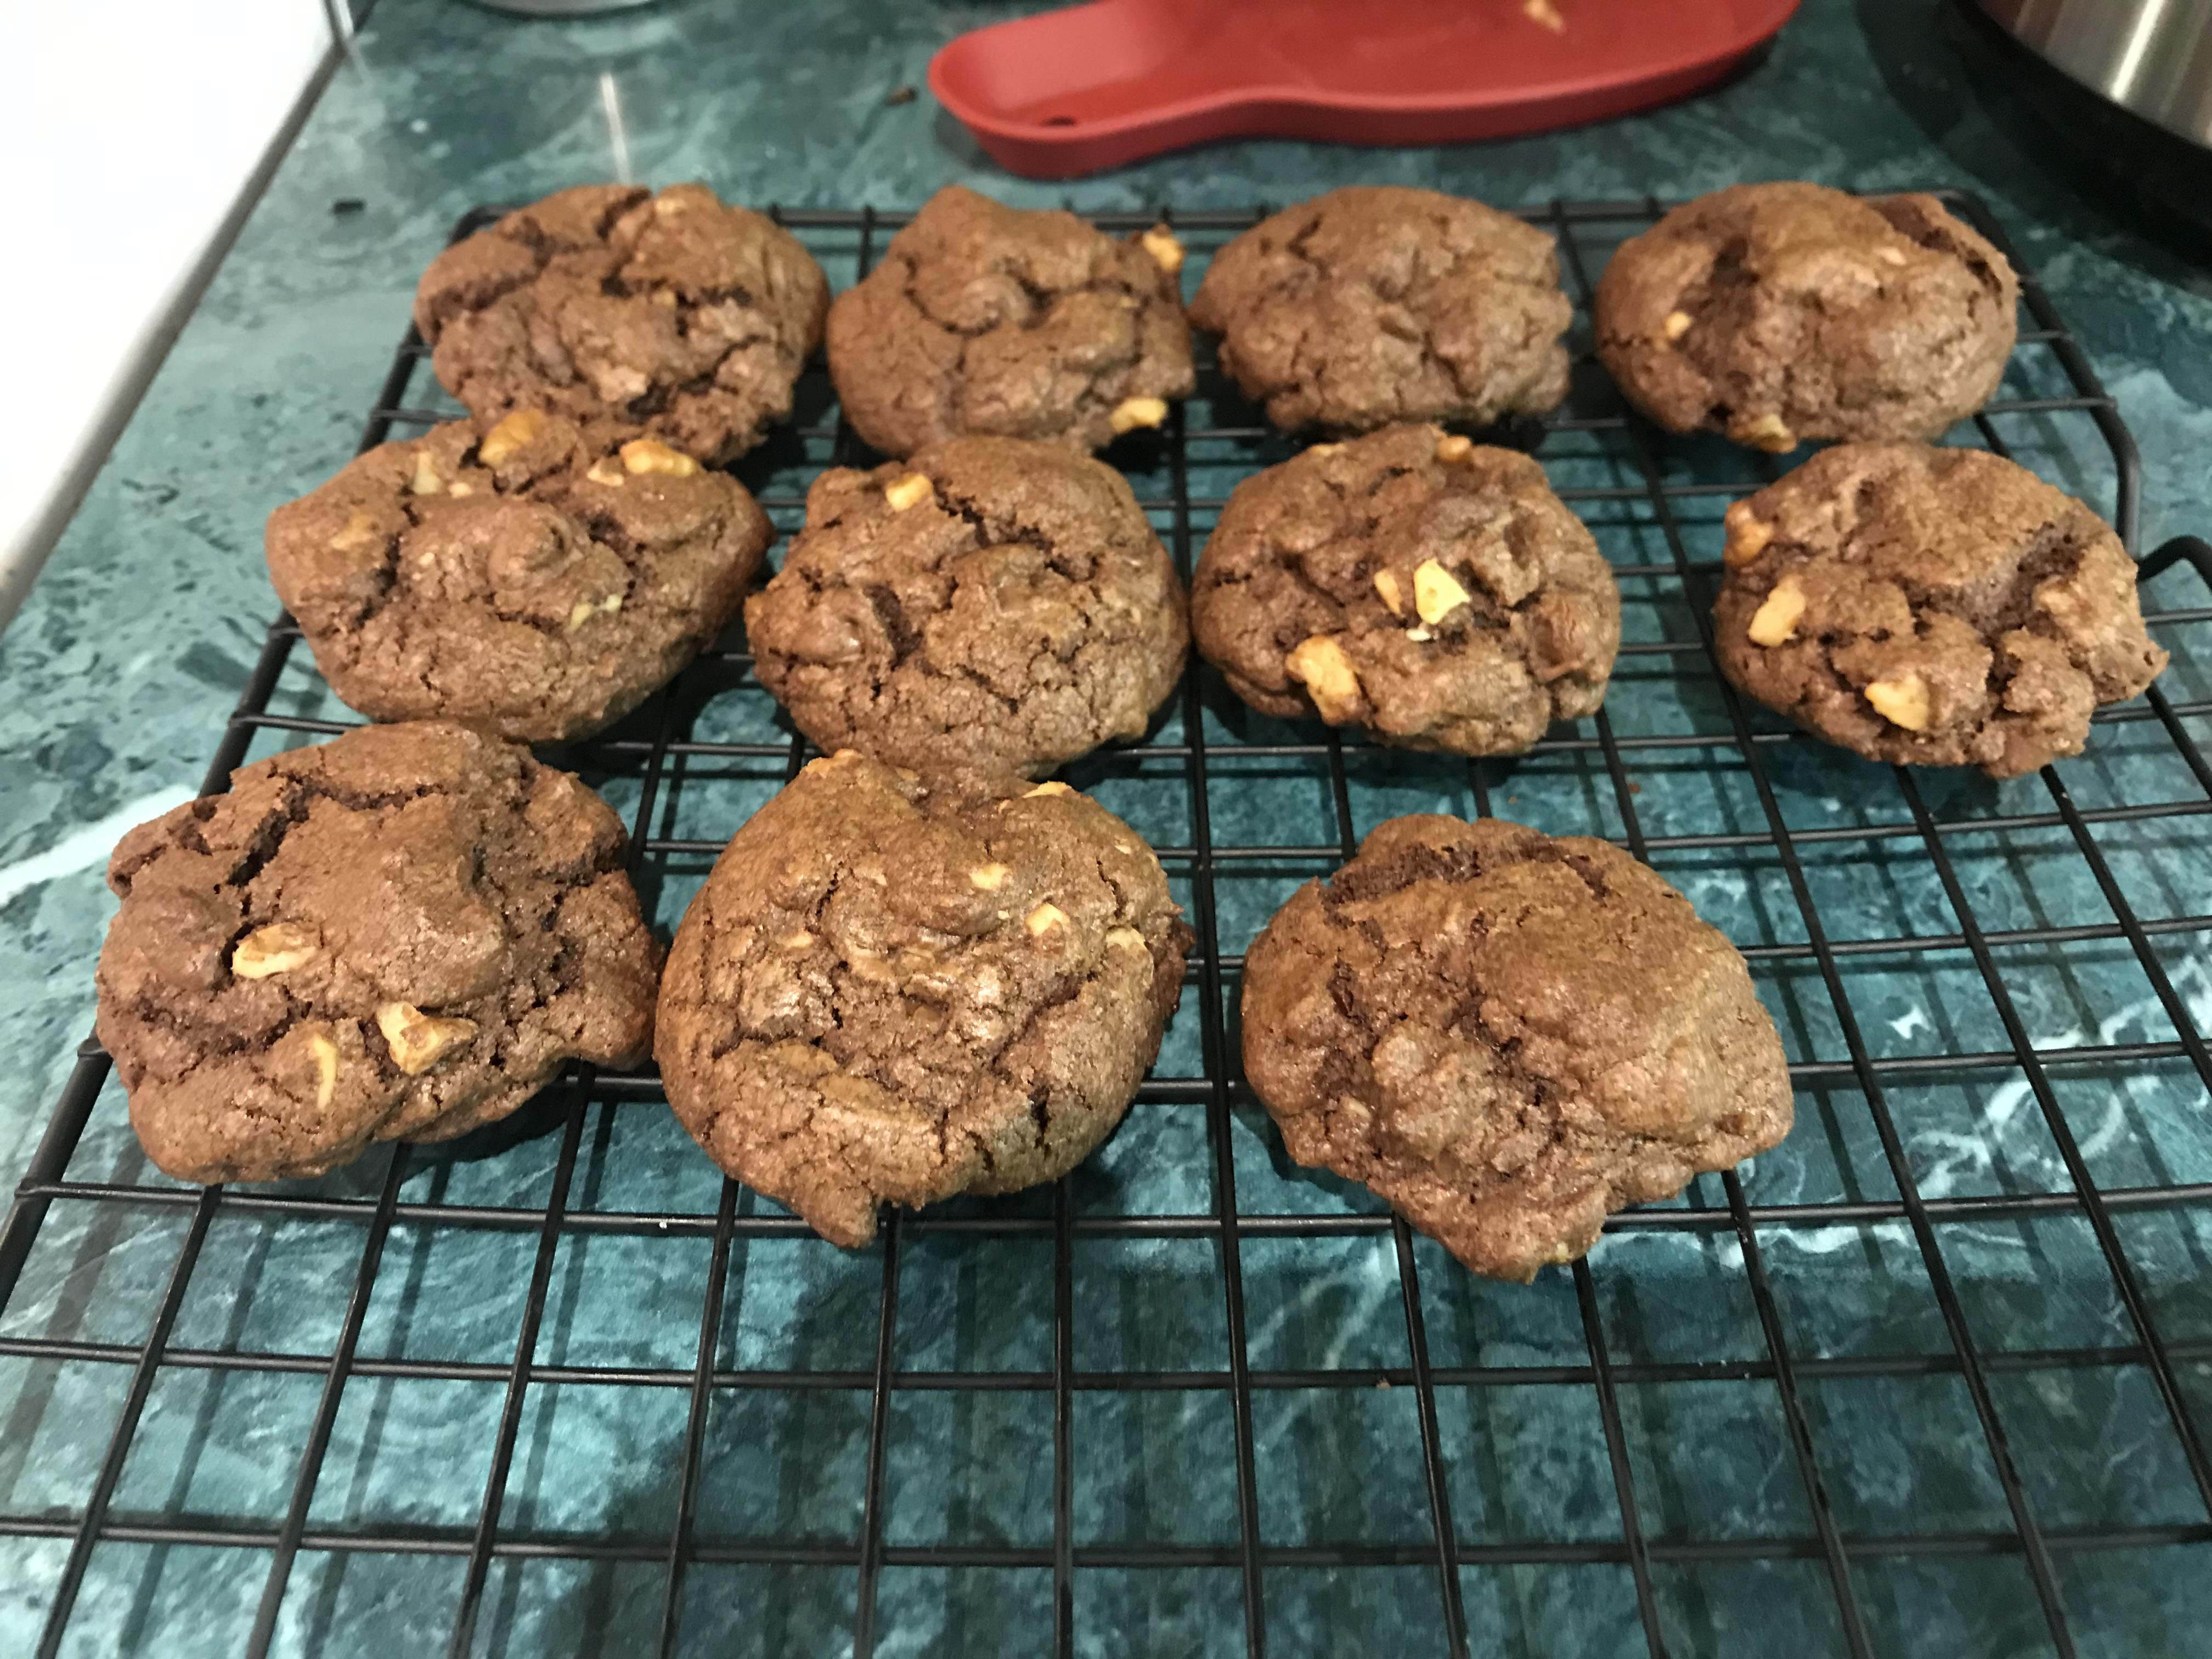 Chocolate Chocolate Chip Cookies I Paul Cole II